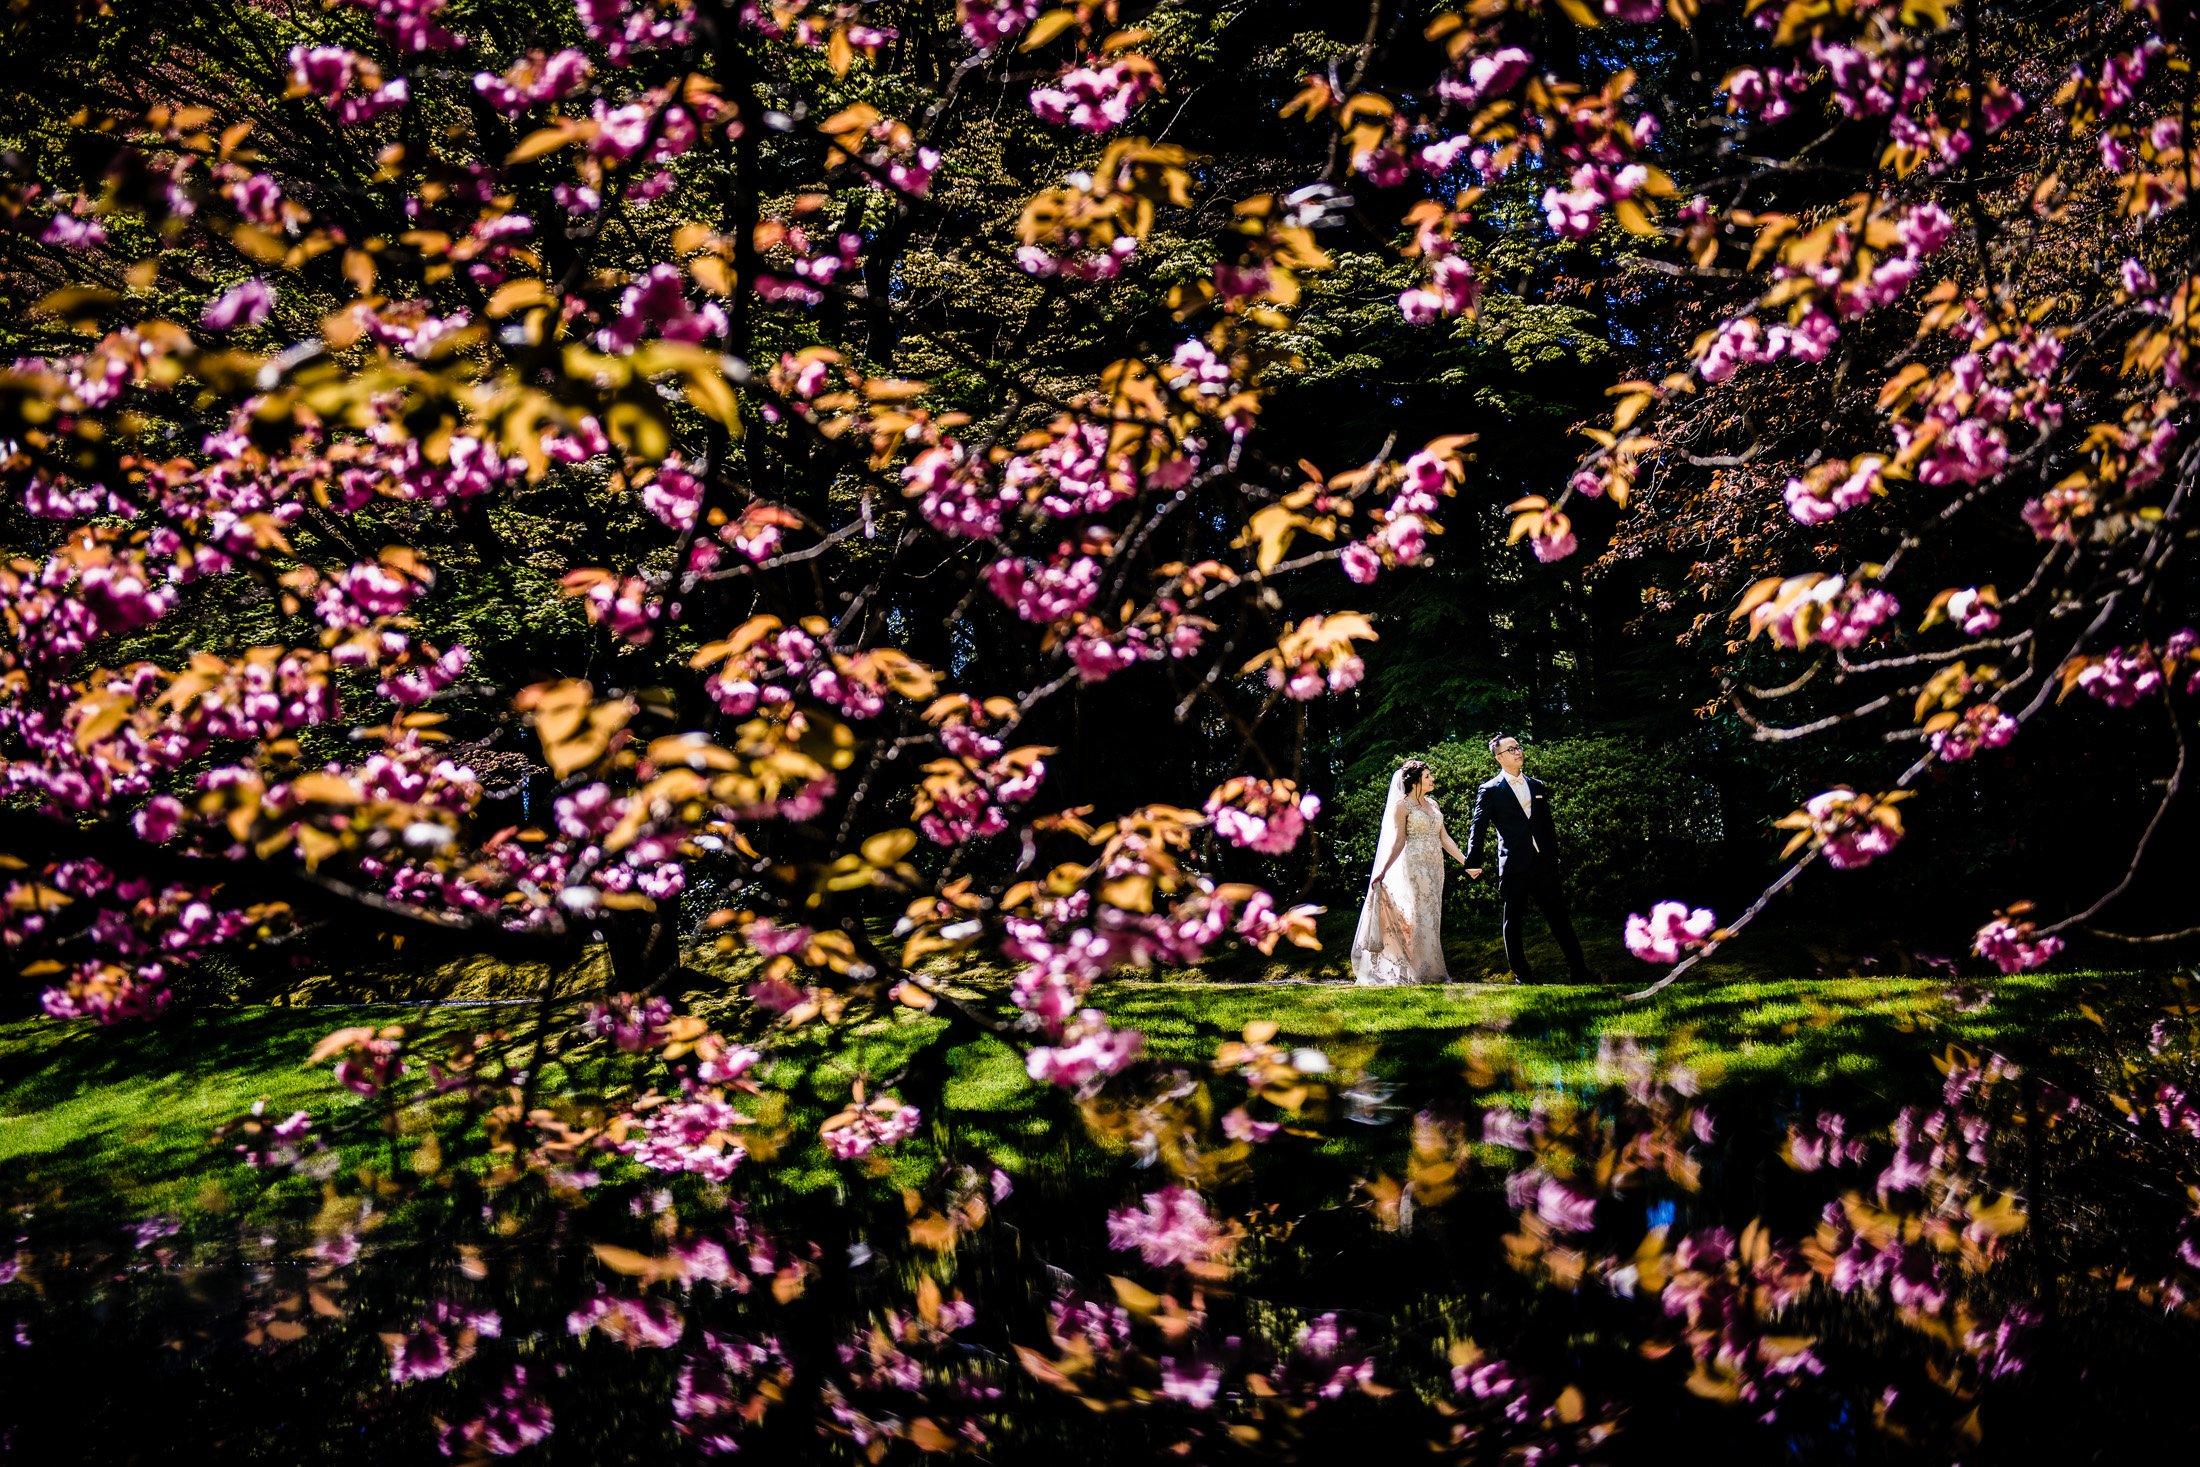 021 - cherry blossom wedding photo